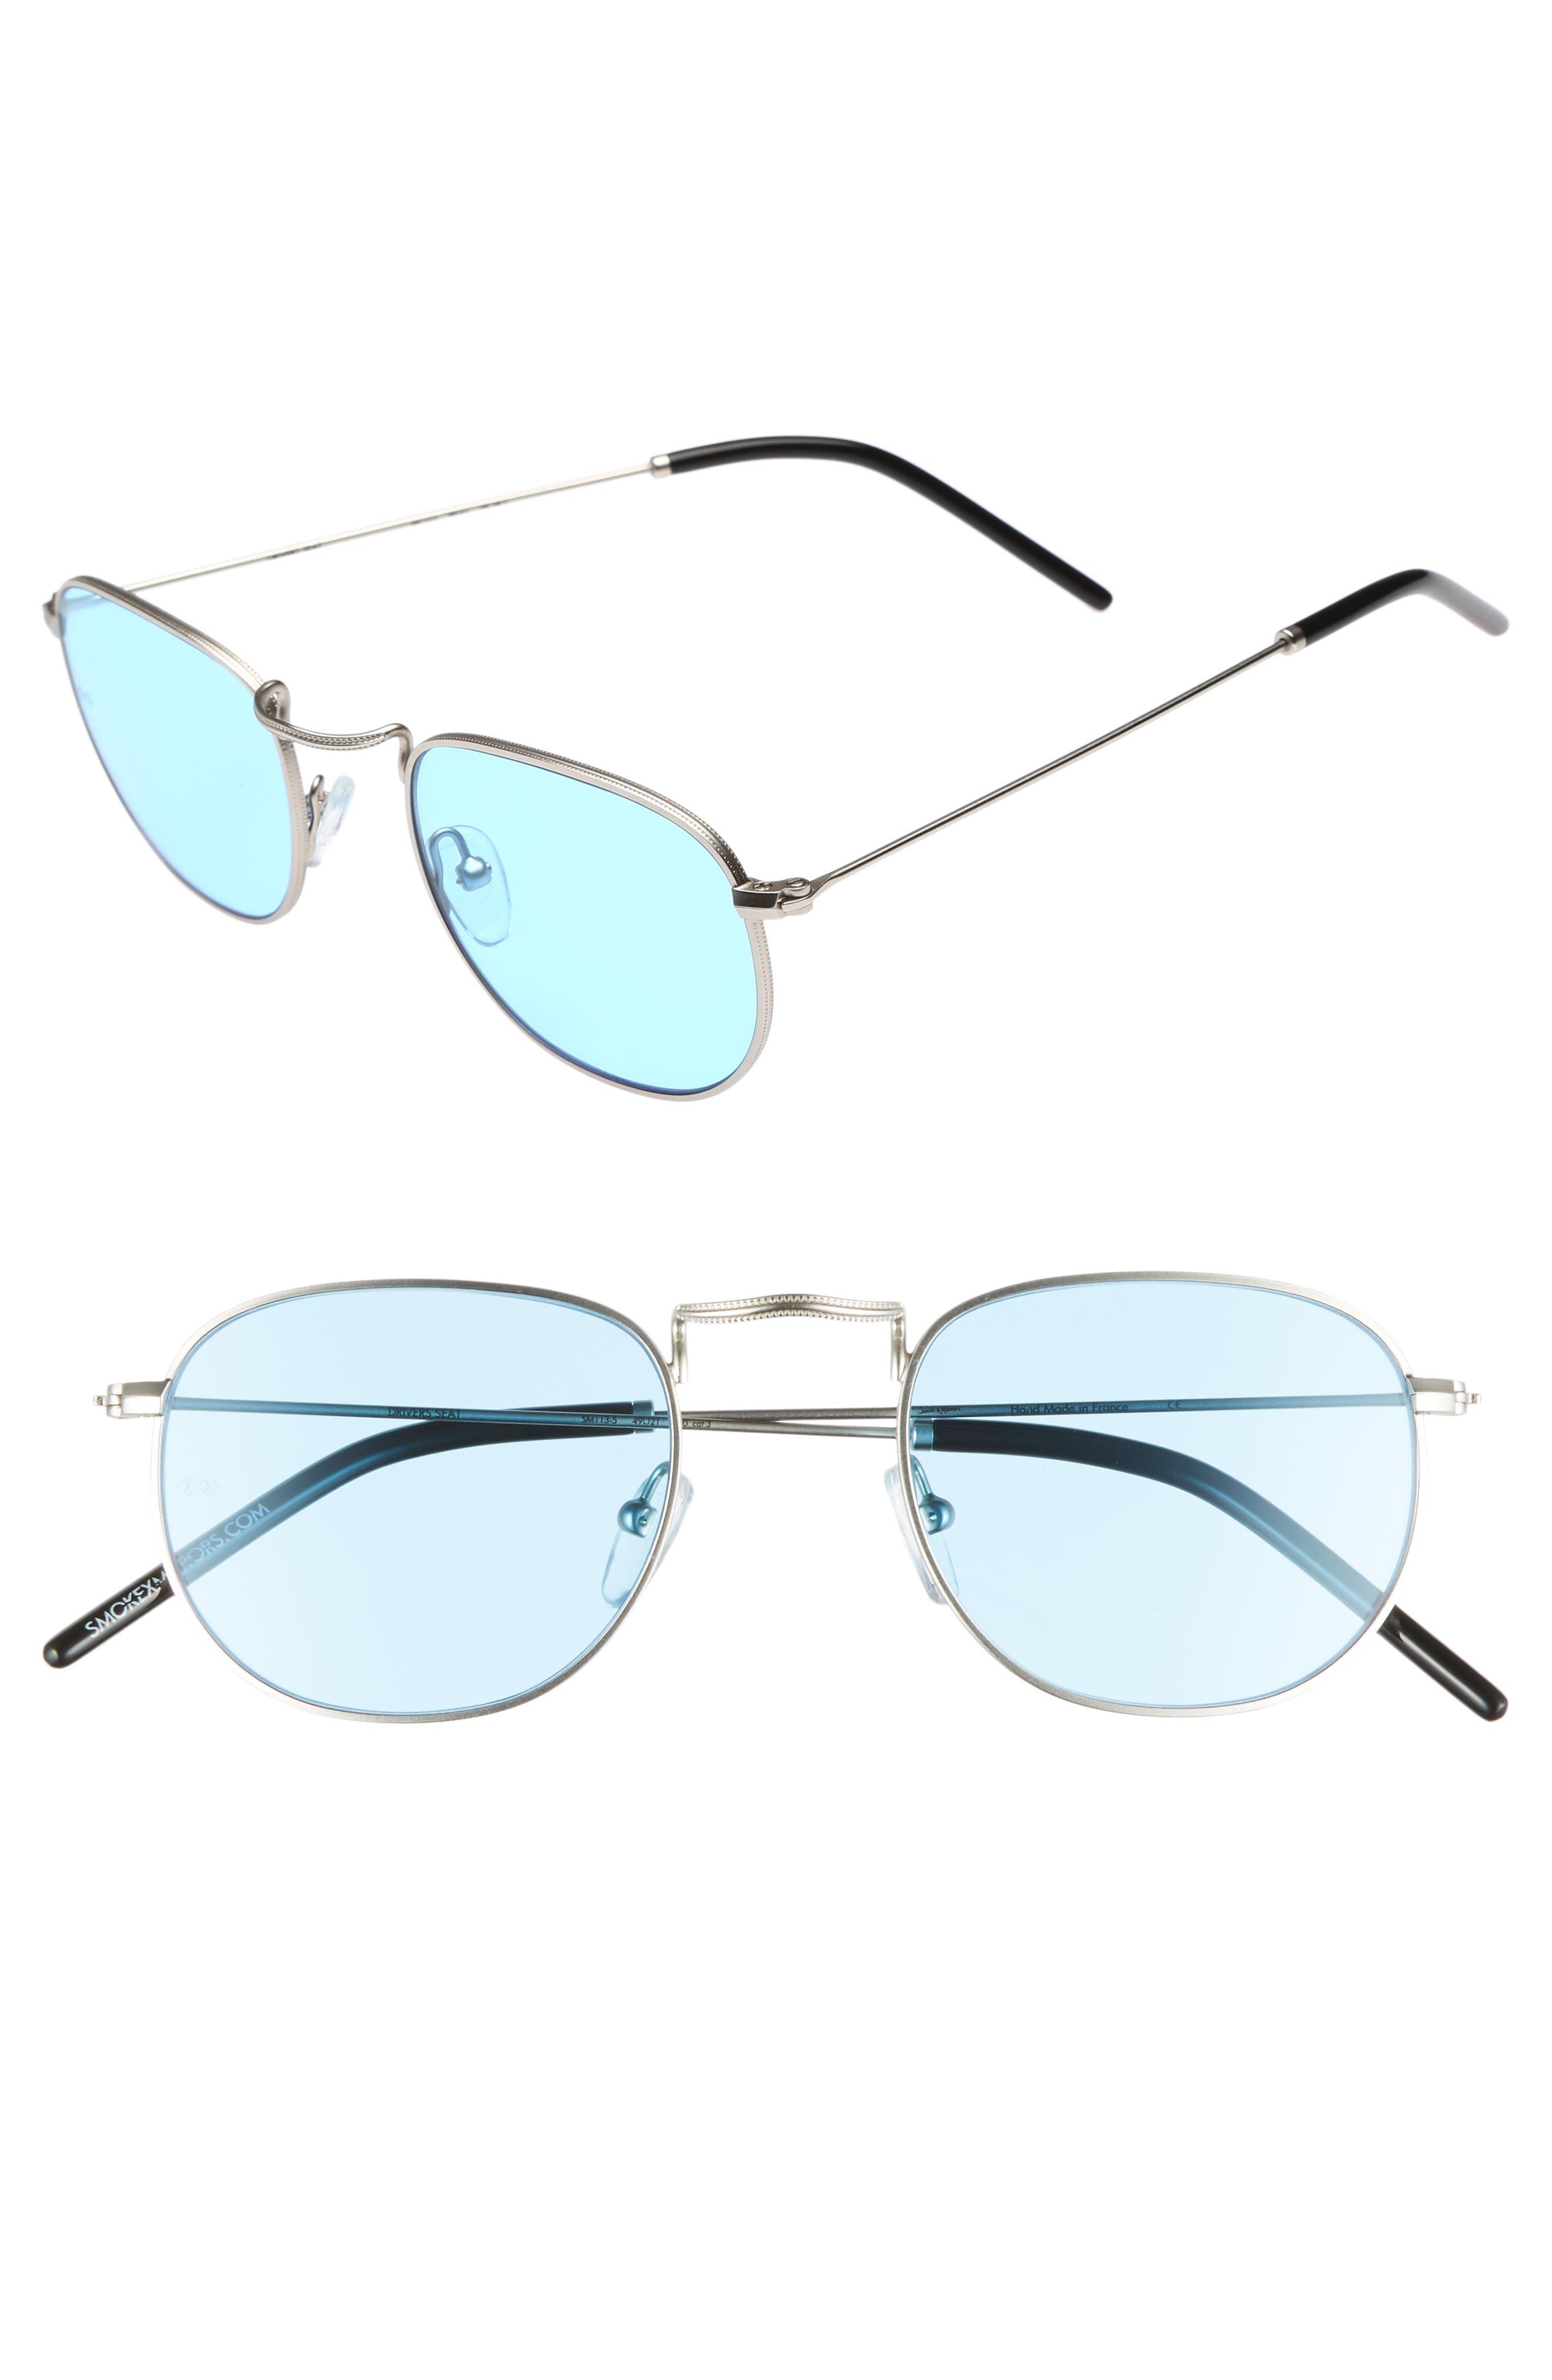 Driver's Seat 49mm Sunglasses,                         Main,                         color, Silver/ Transparent Blue